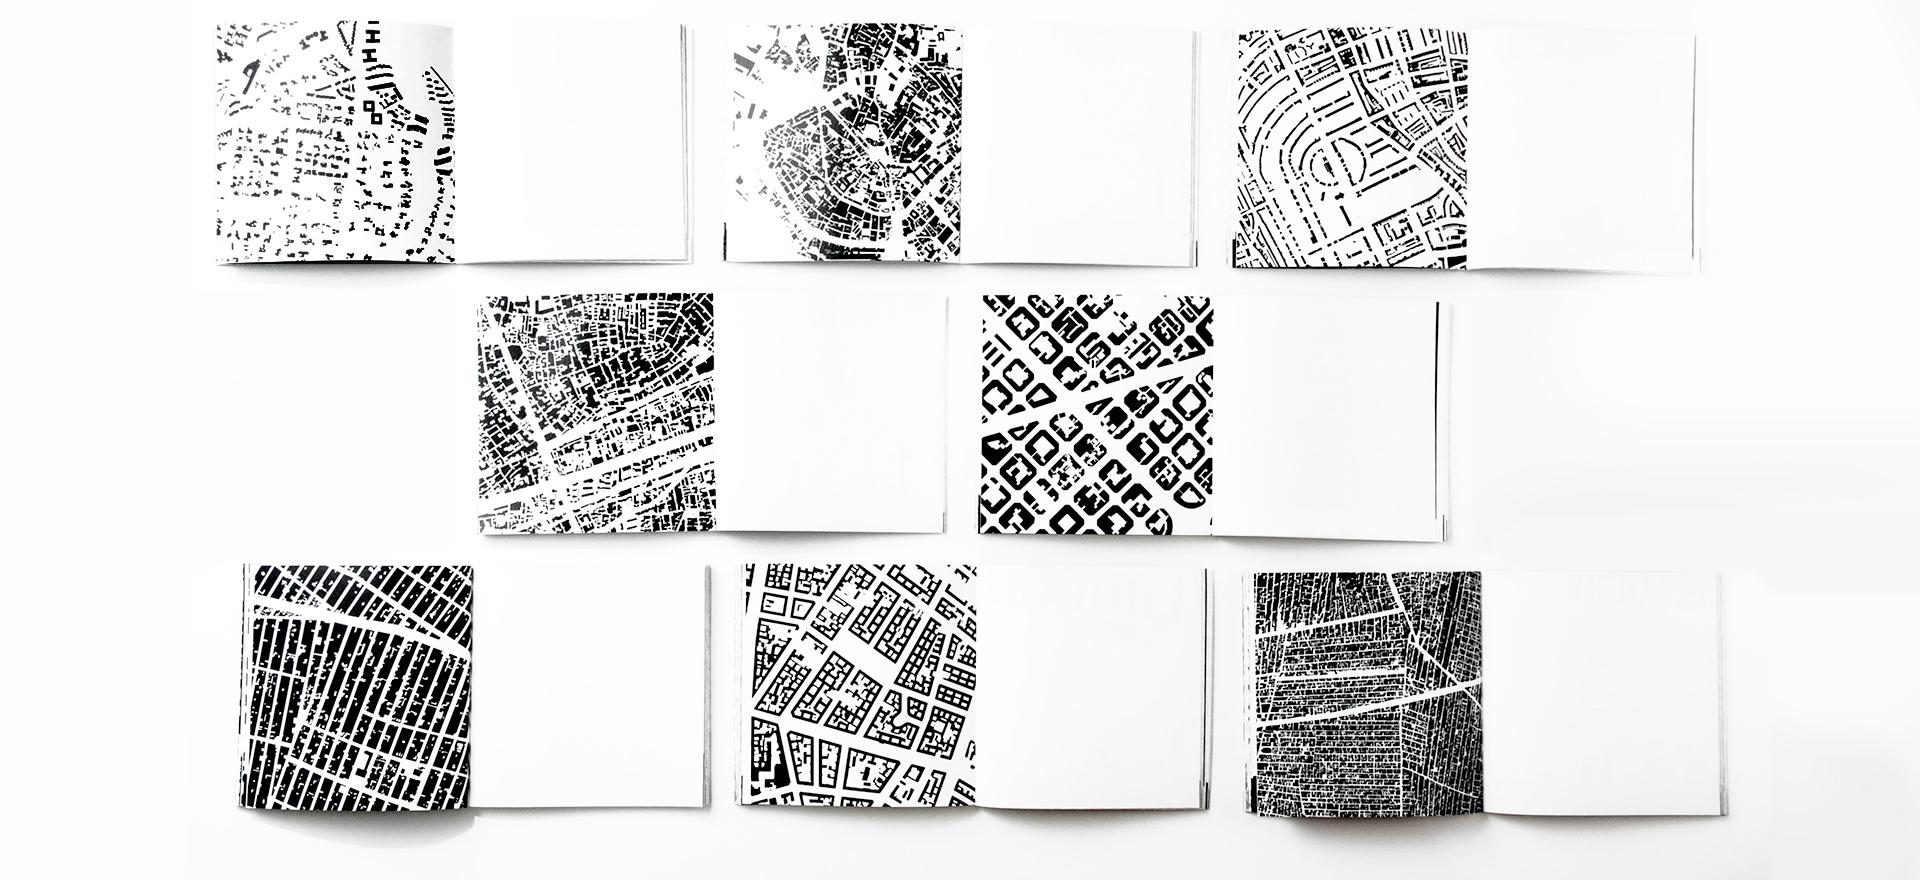 La Biennale di Venezia | Urban Design | Catalogues | Cities as models of sustainability | Mario Trimarchi Design | Fragile 2